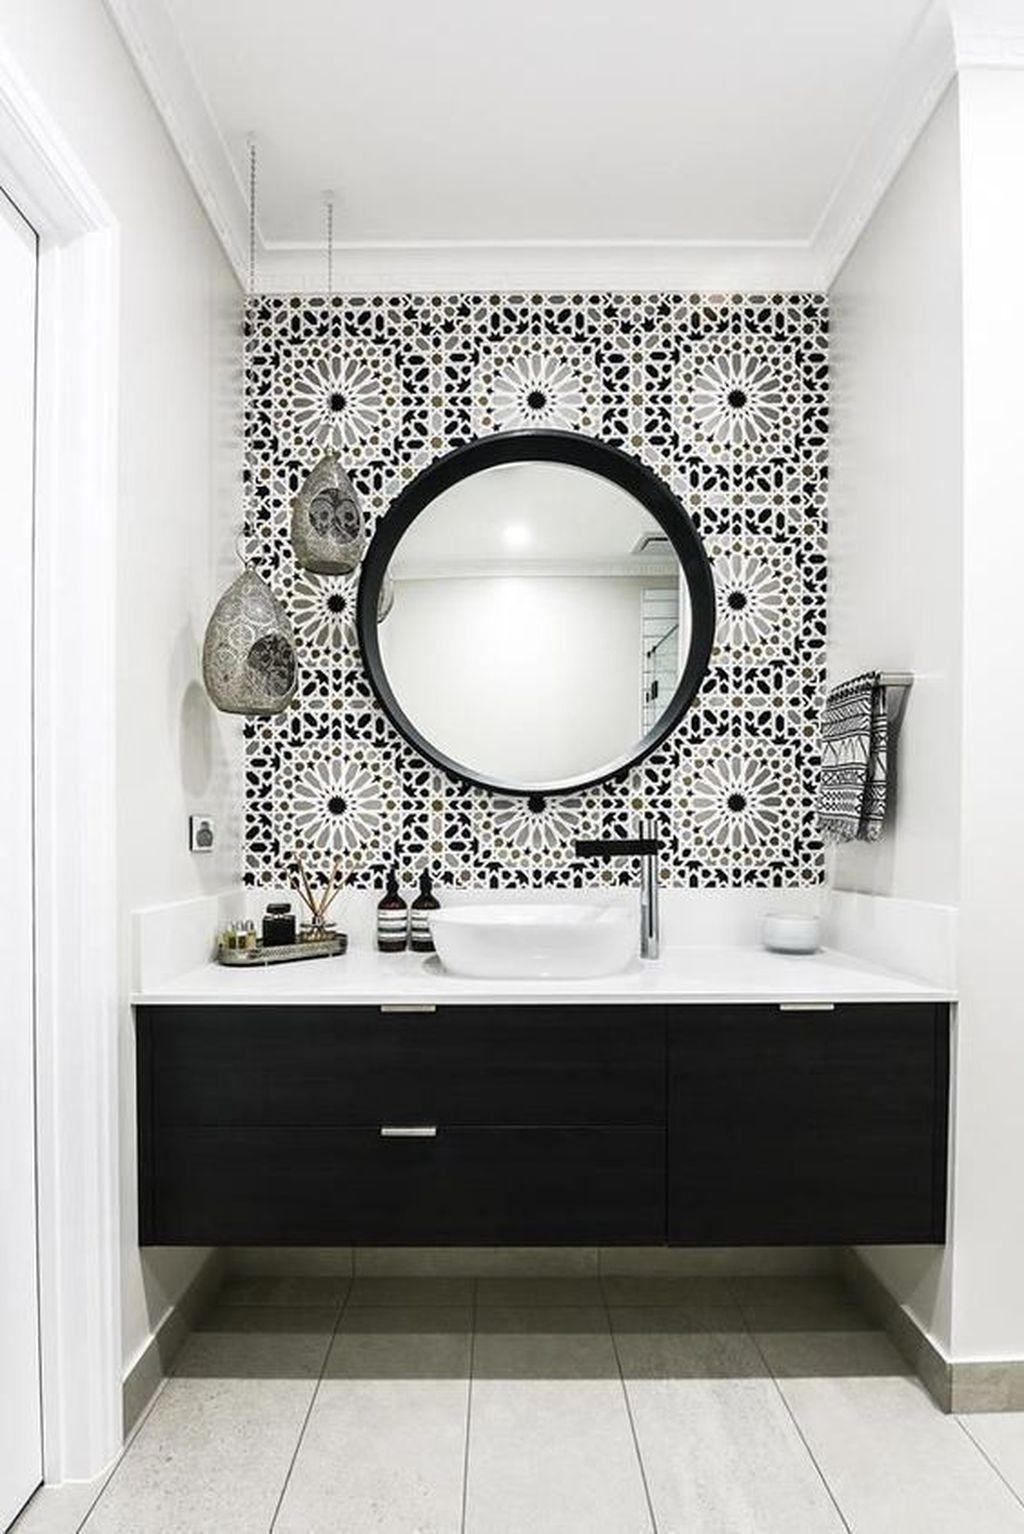 49 Fancy Bathroom Mirror Ideas For Your Bathroom In 2020